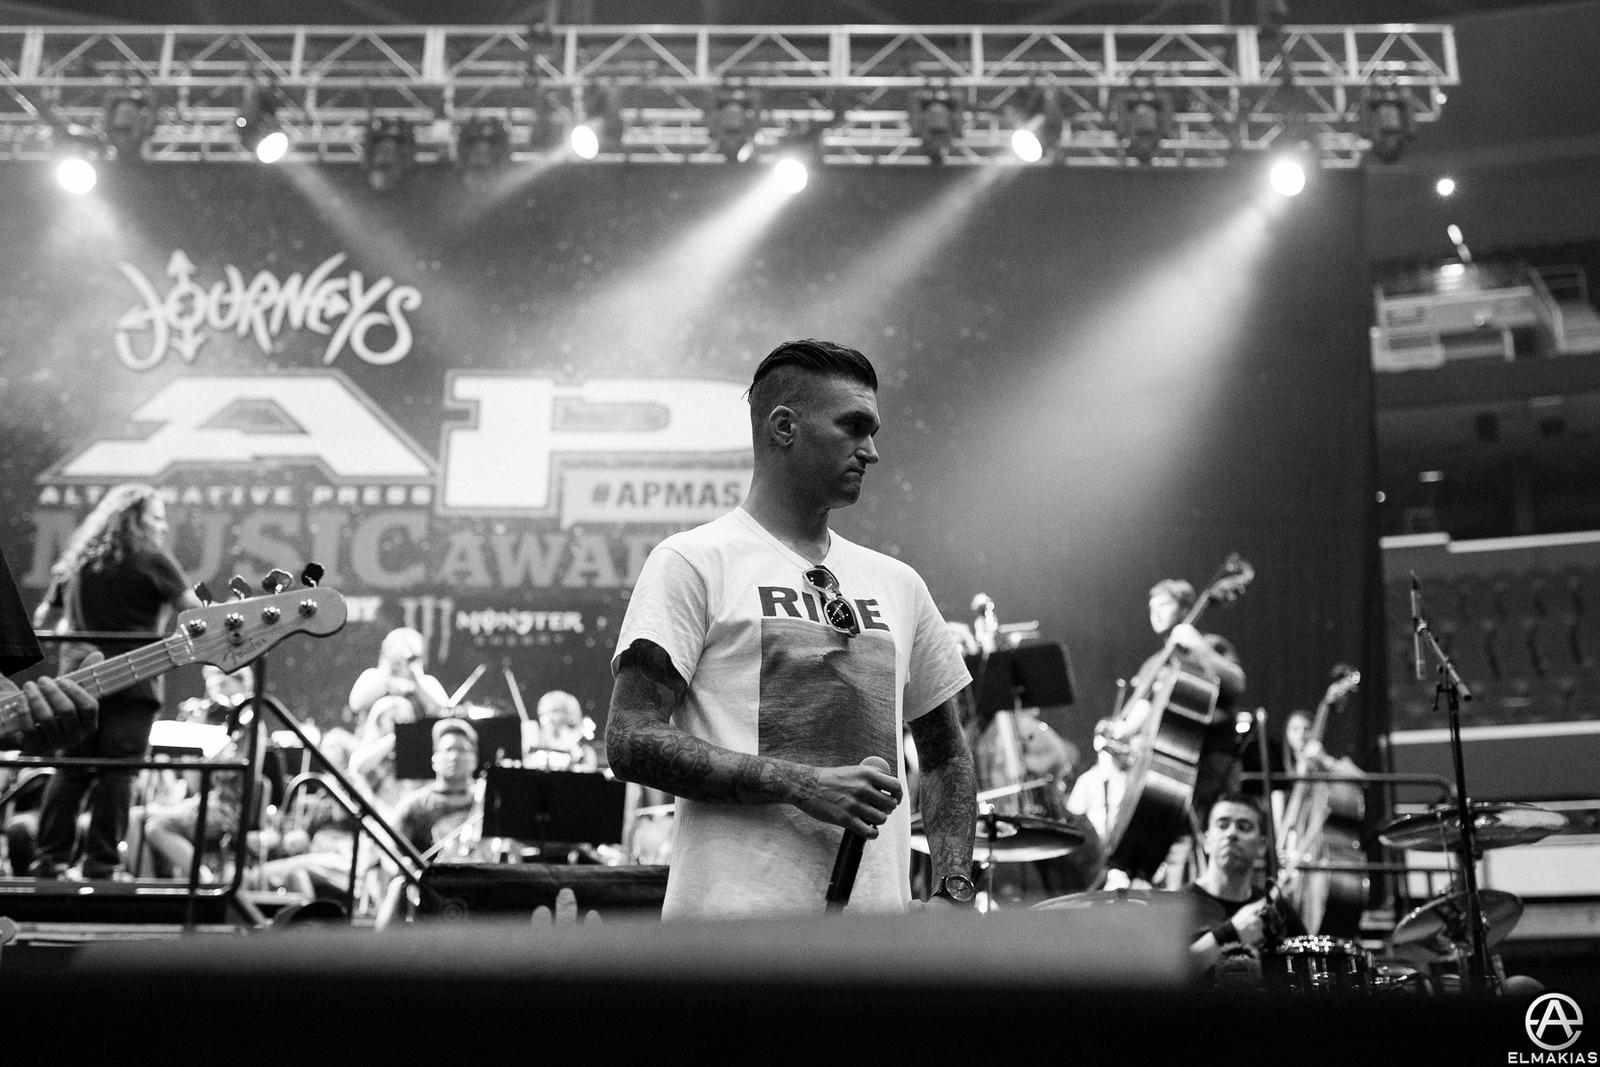 Jordan Pundik of New Found Glory at rehearsals for the Alternative Press Music Awards 2015 by Adam Elmakias